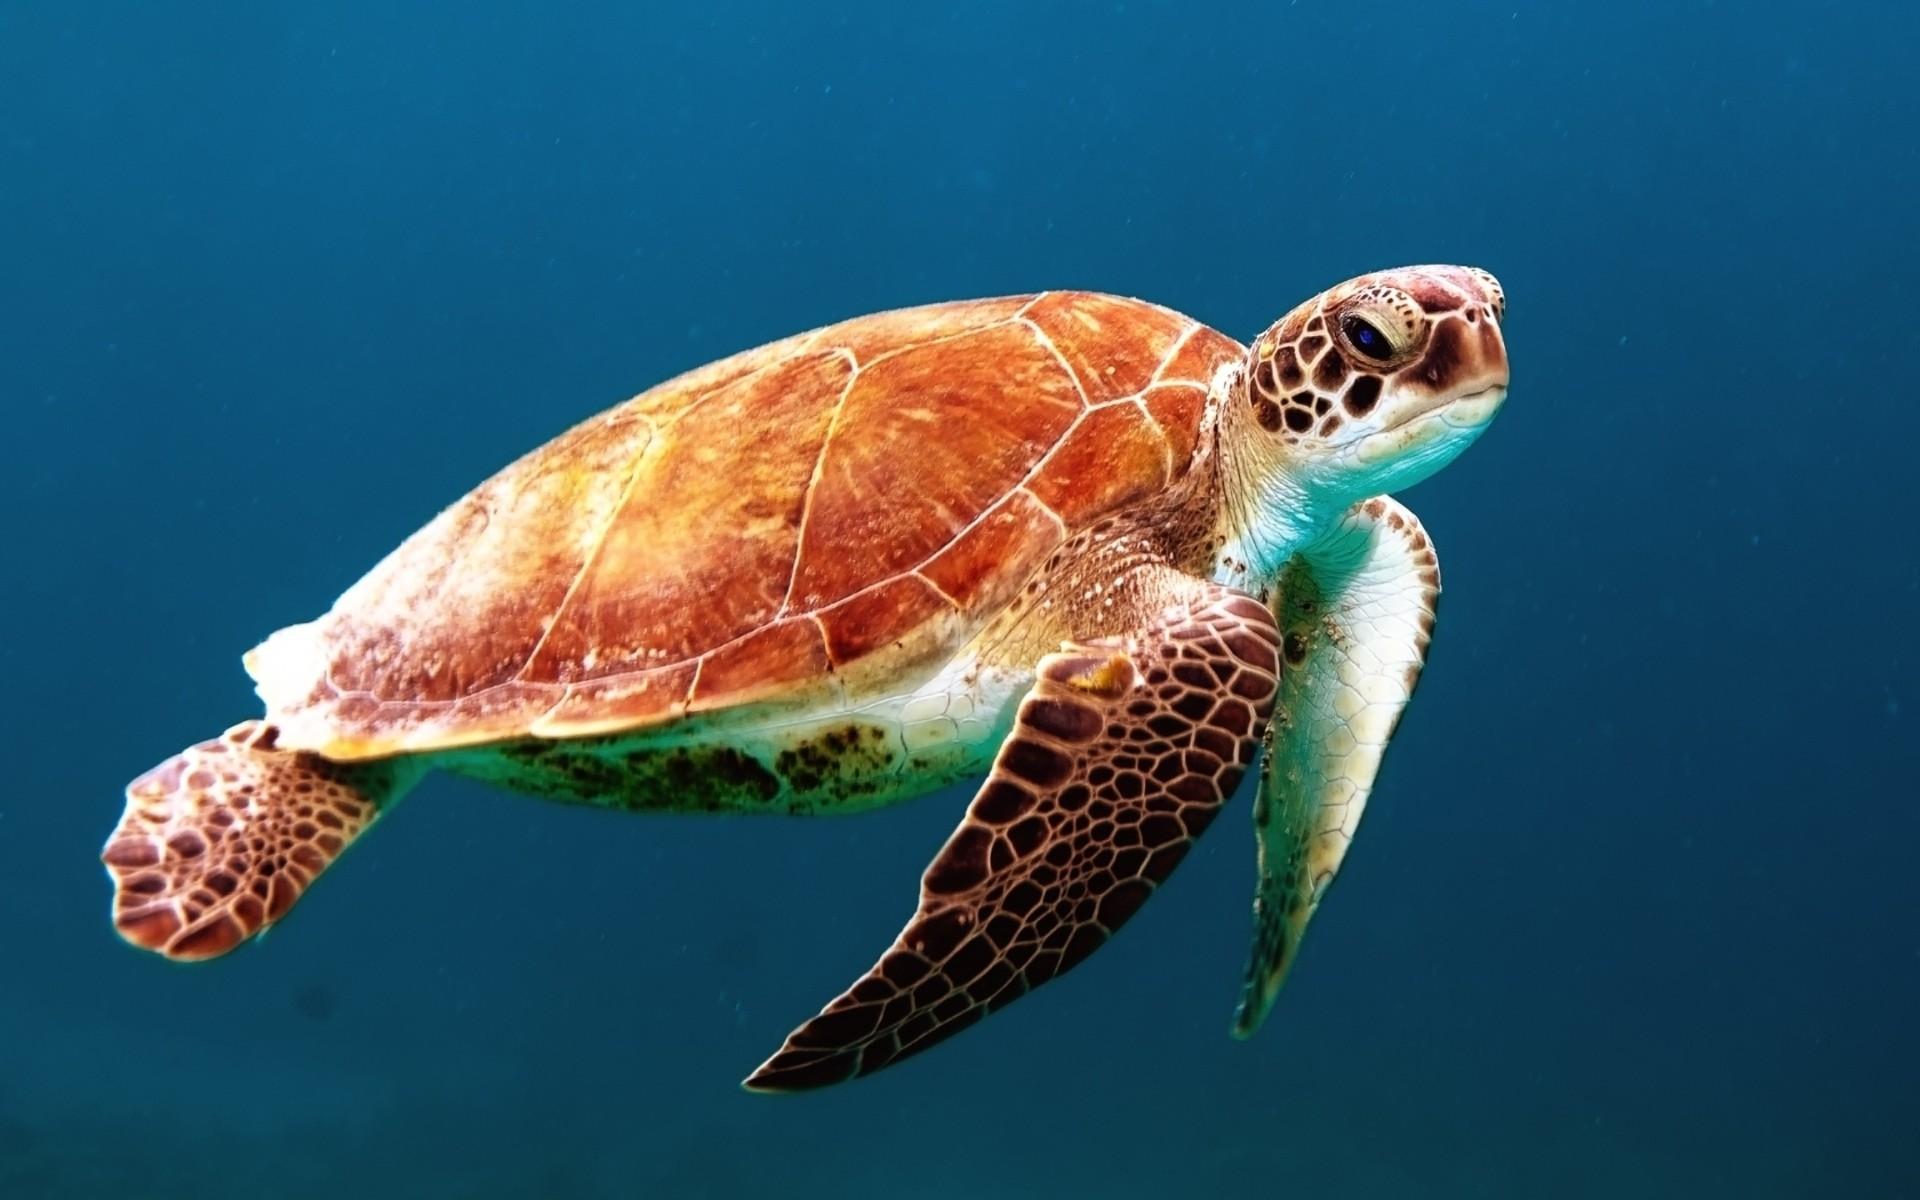 Green Sea Turtle Wallpaper #259554 - Resolution 1920x1200 px